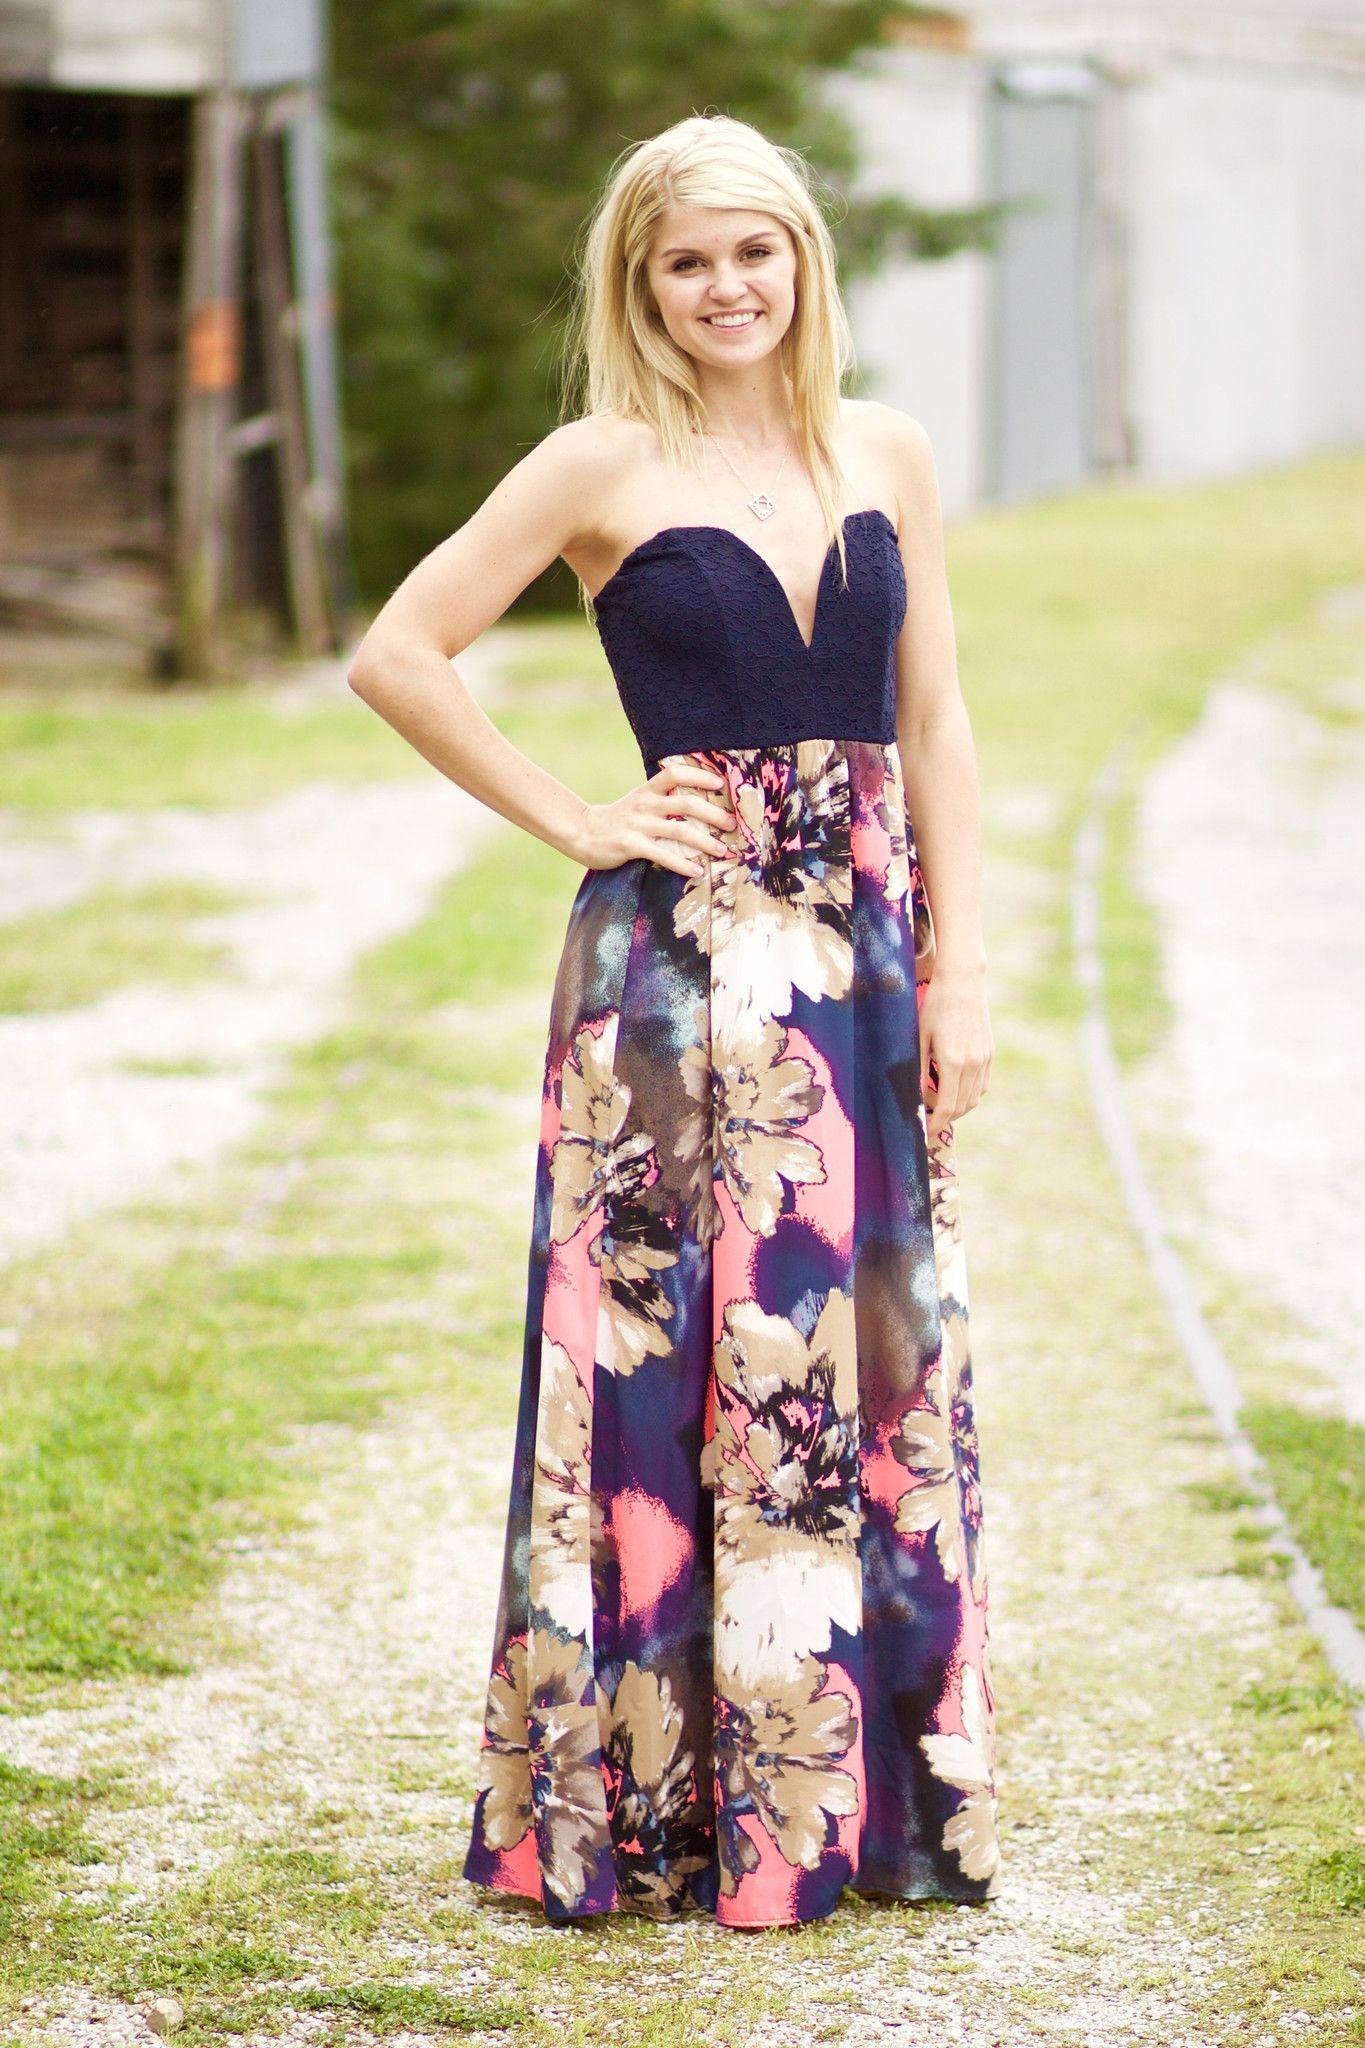 Southern Sweetheart Maxi Dress Dresses Strapless Dress Formal Maxi Dress [ 2048 x 1365 Pixel ]